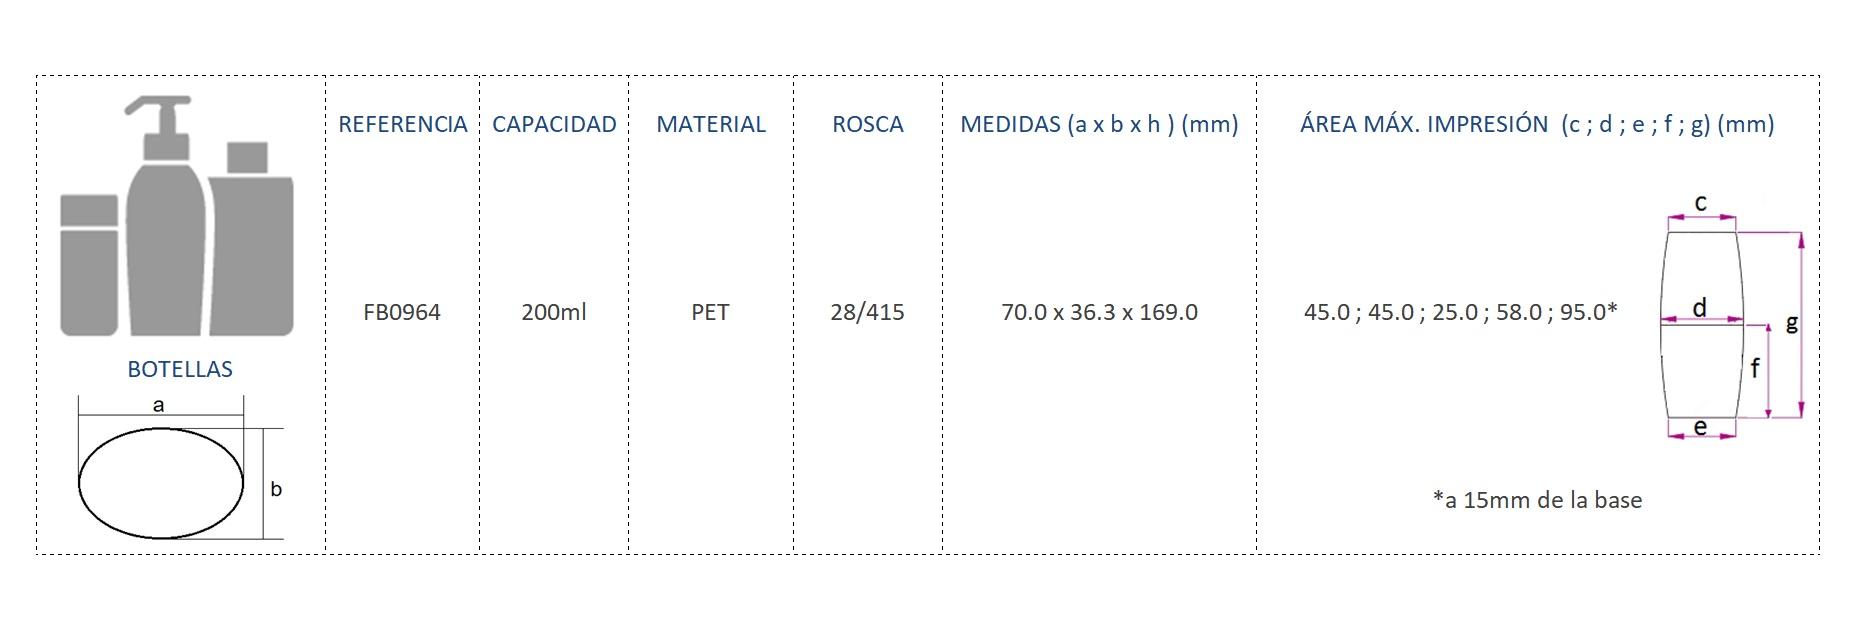 Cuadro de materiales botella FB0964